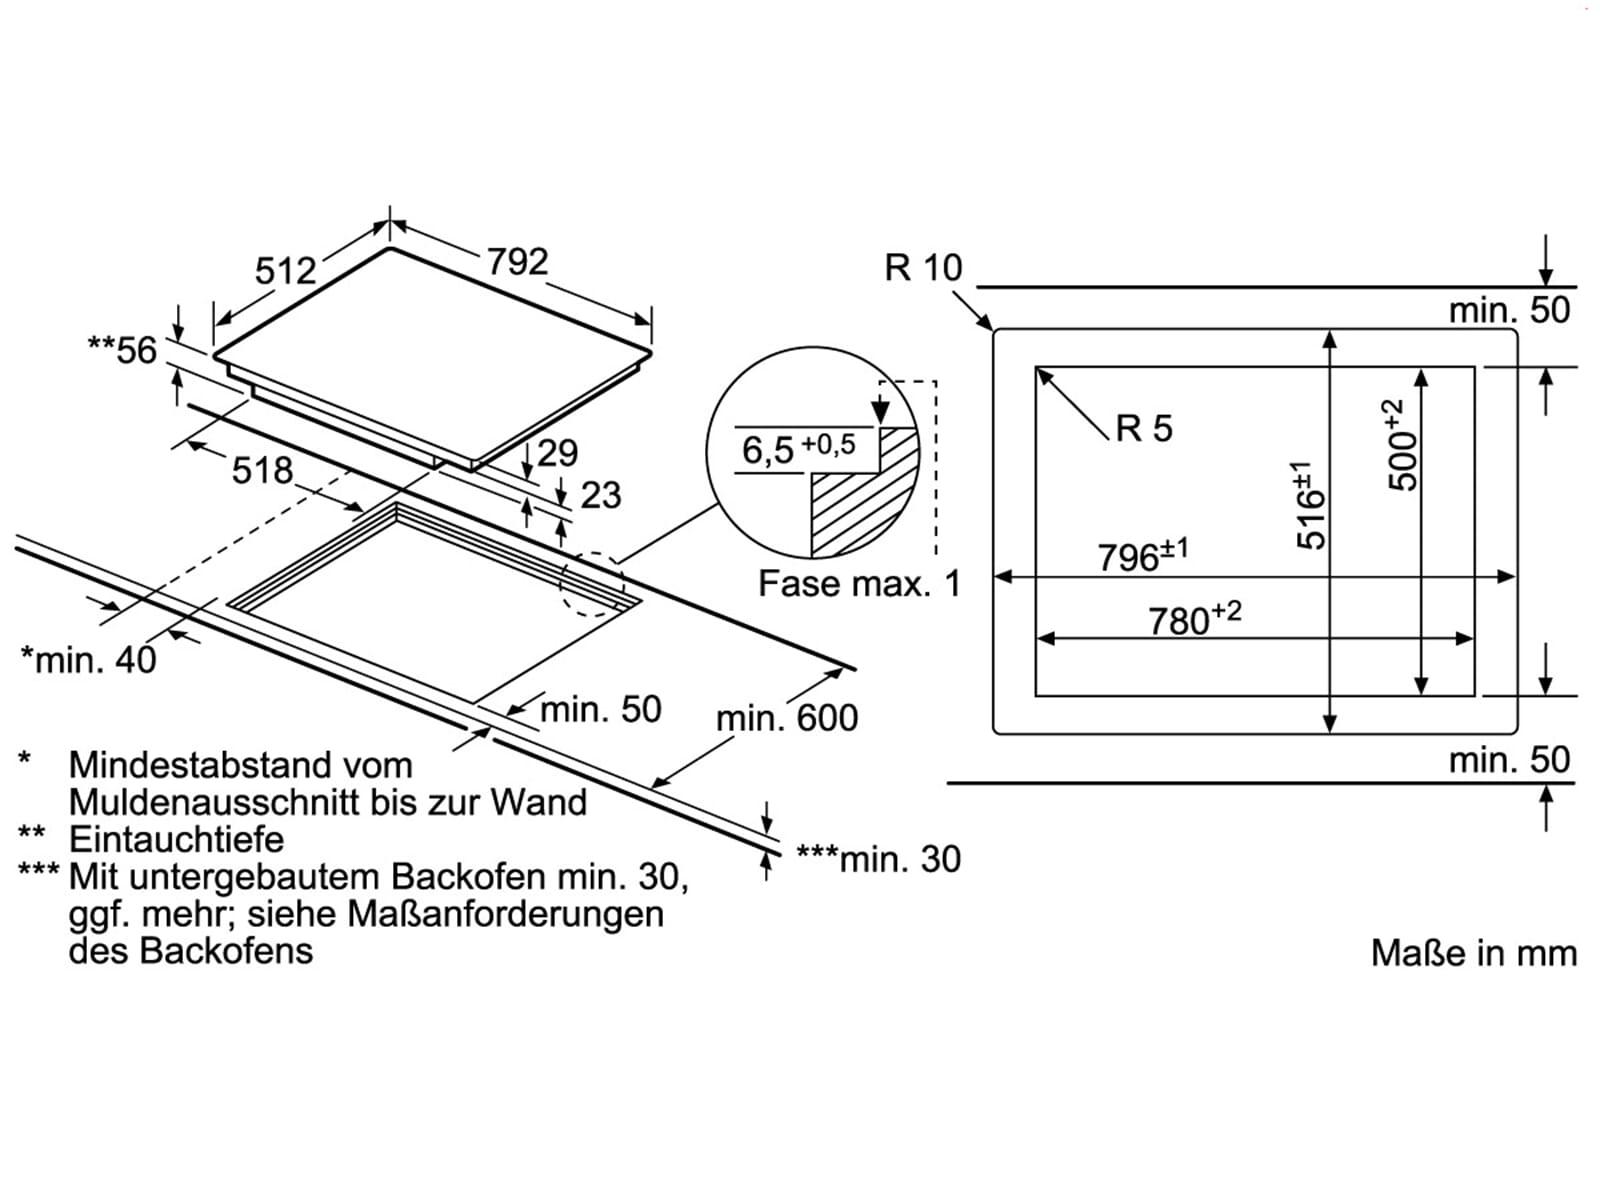 siemens ex801kye1e induktion glaskeramik kochfeld autark. Black Bedroom Furniture Sets. Home Design Ideas